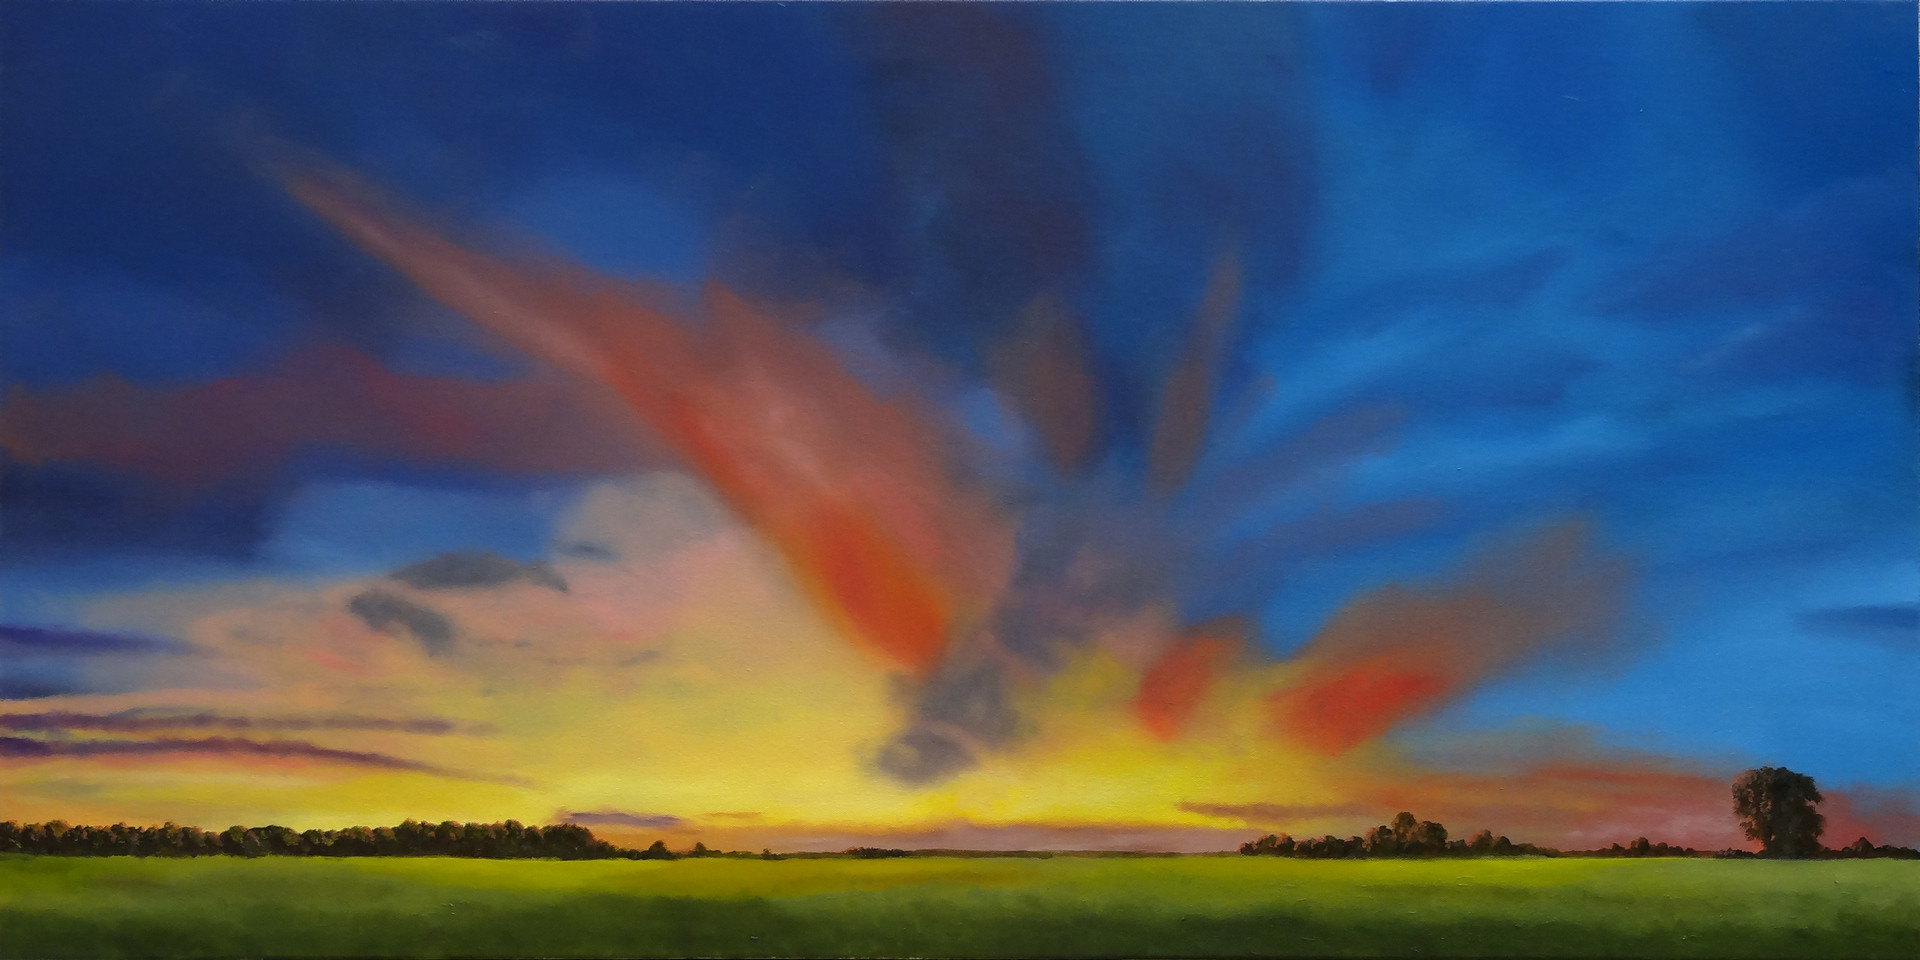 DSC04973cr_Blue-organge sunset 1920px.jp